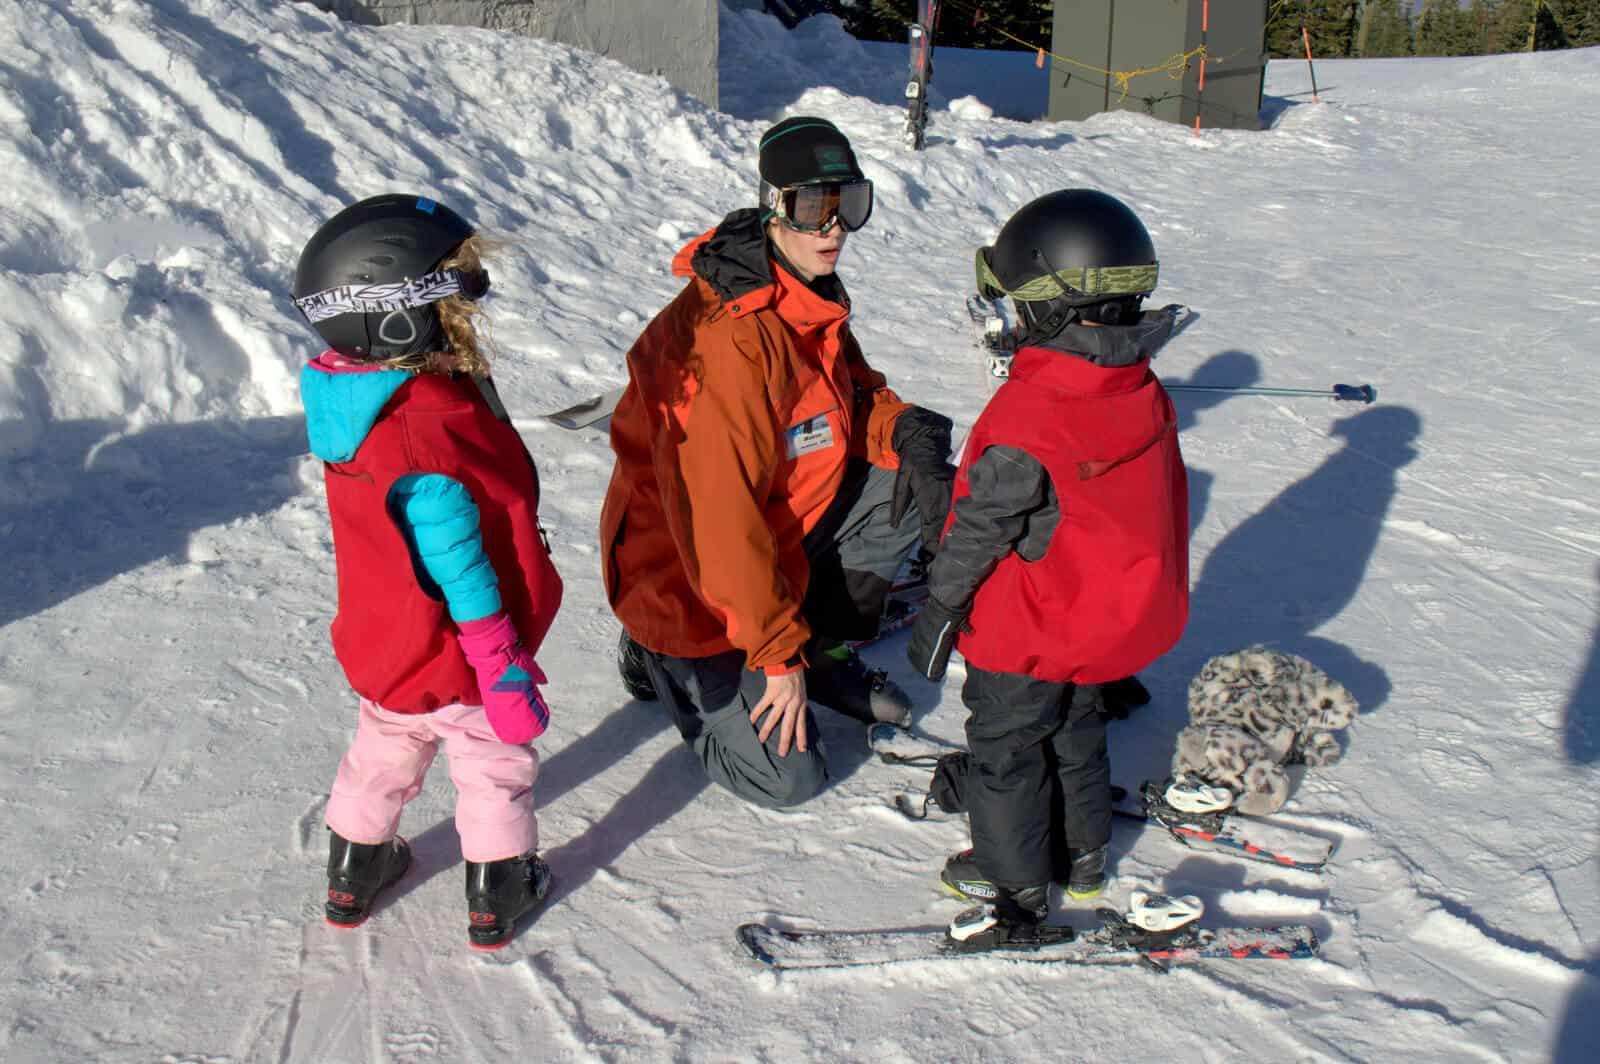 Mt. Ashland Ski School Instructor And Students